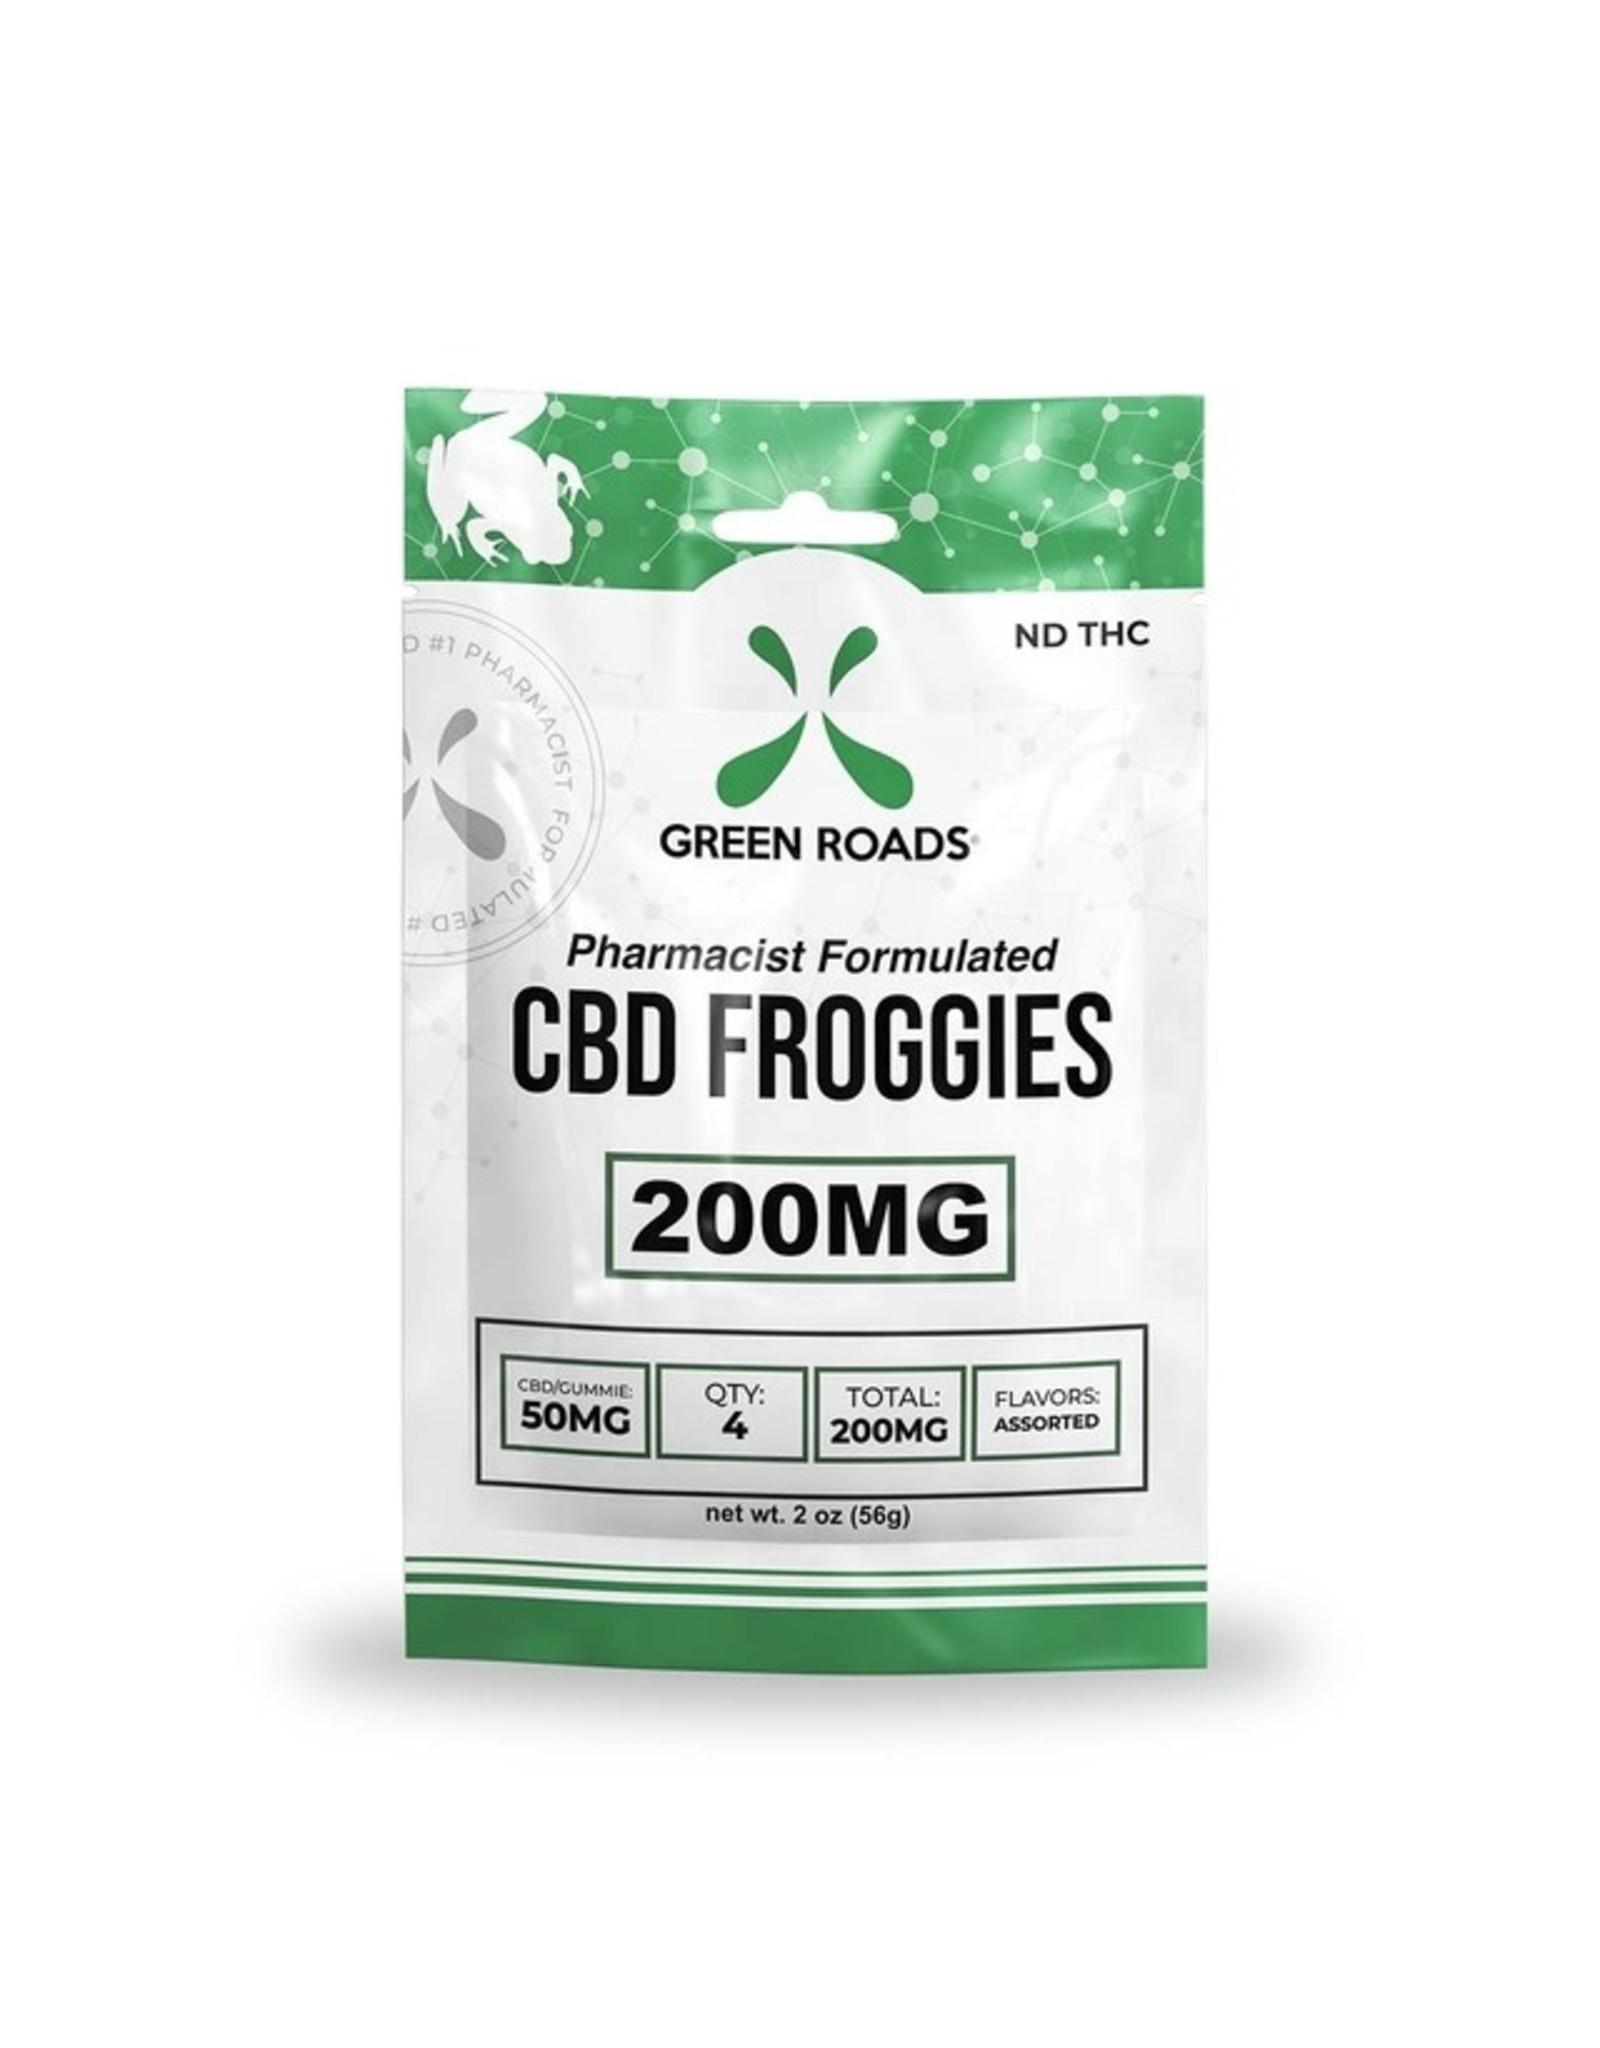 Green Roads Green Roads CBD Froggies 200 mg sweet